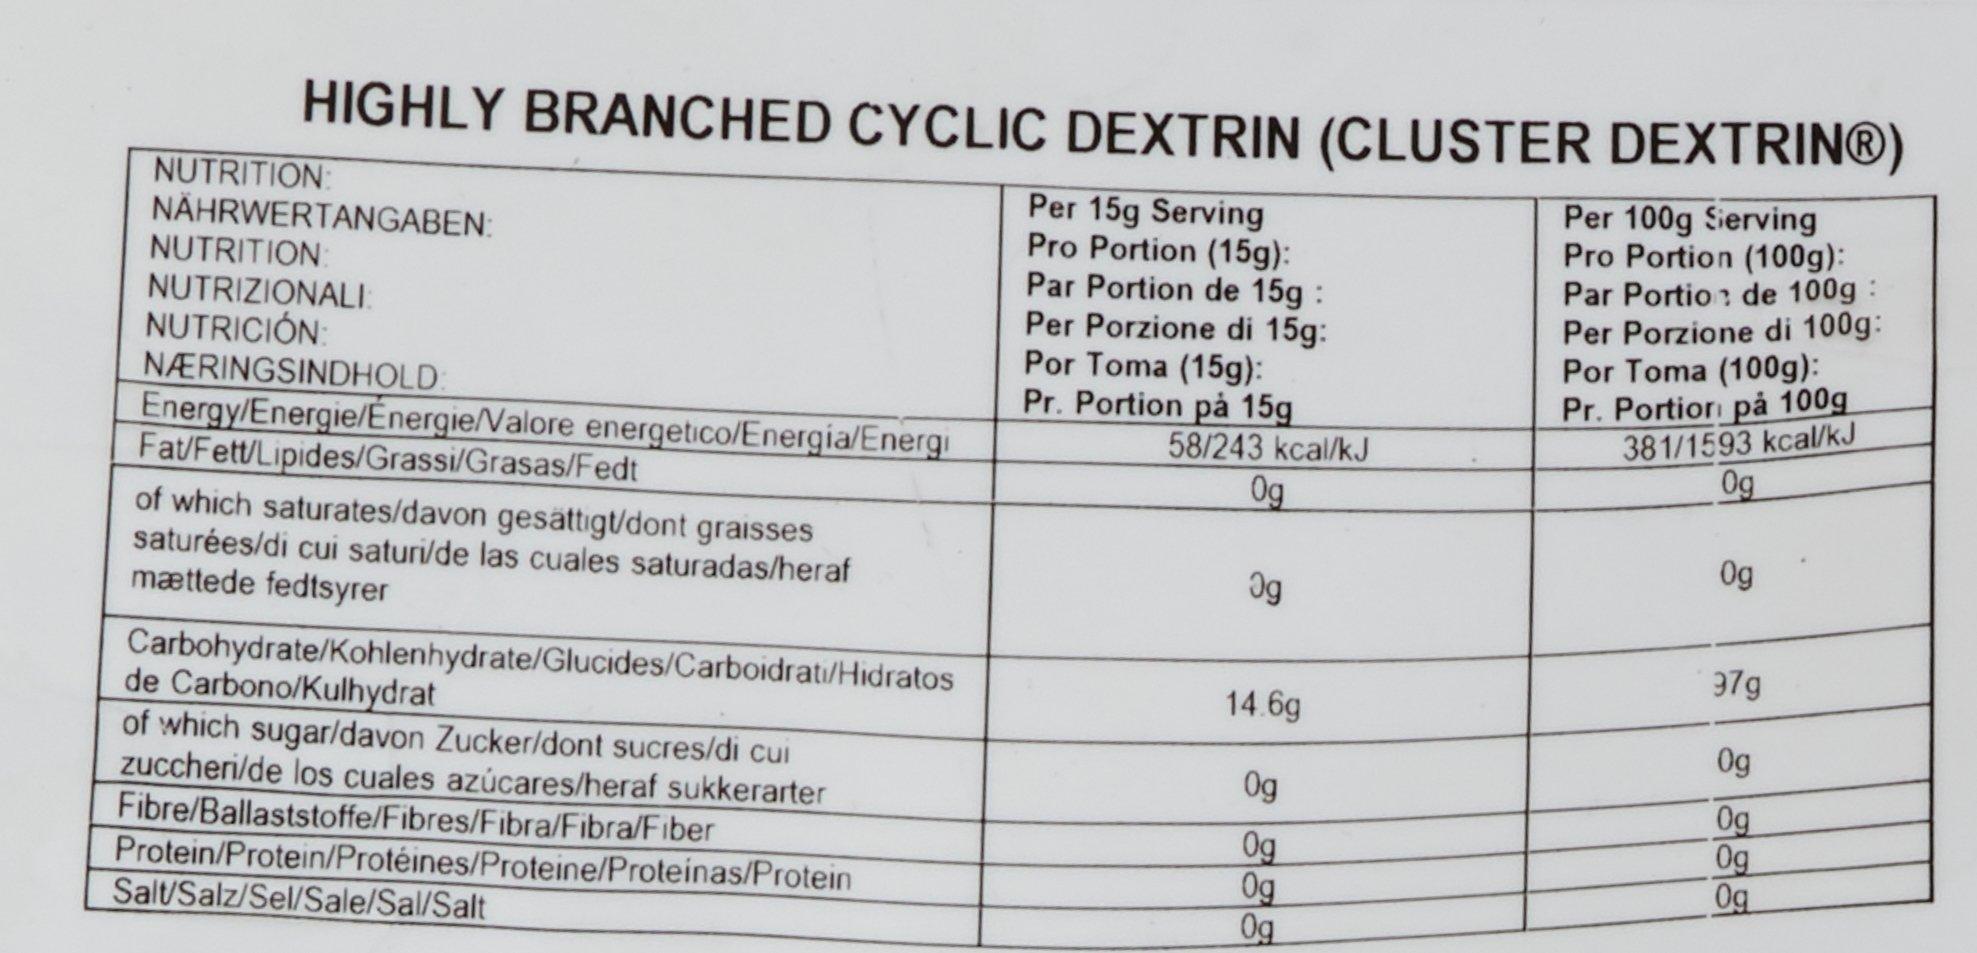 71uwodY k3L - Bulk Highly Branched Cyclic Dextrin Powder, 2.5 kg, Packaging May Vary